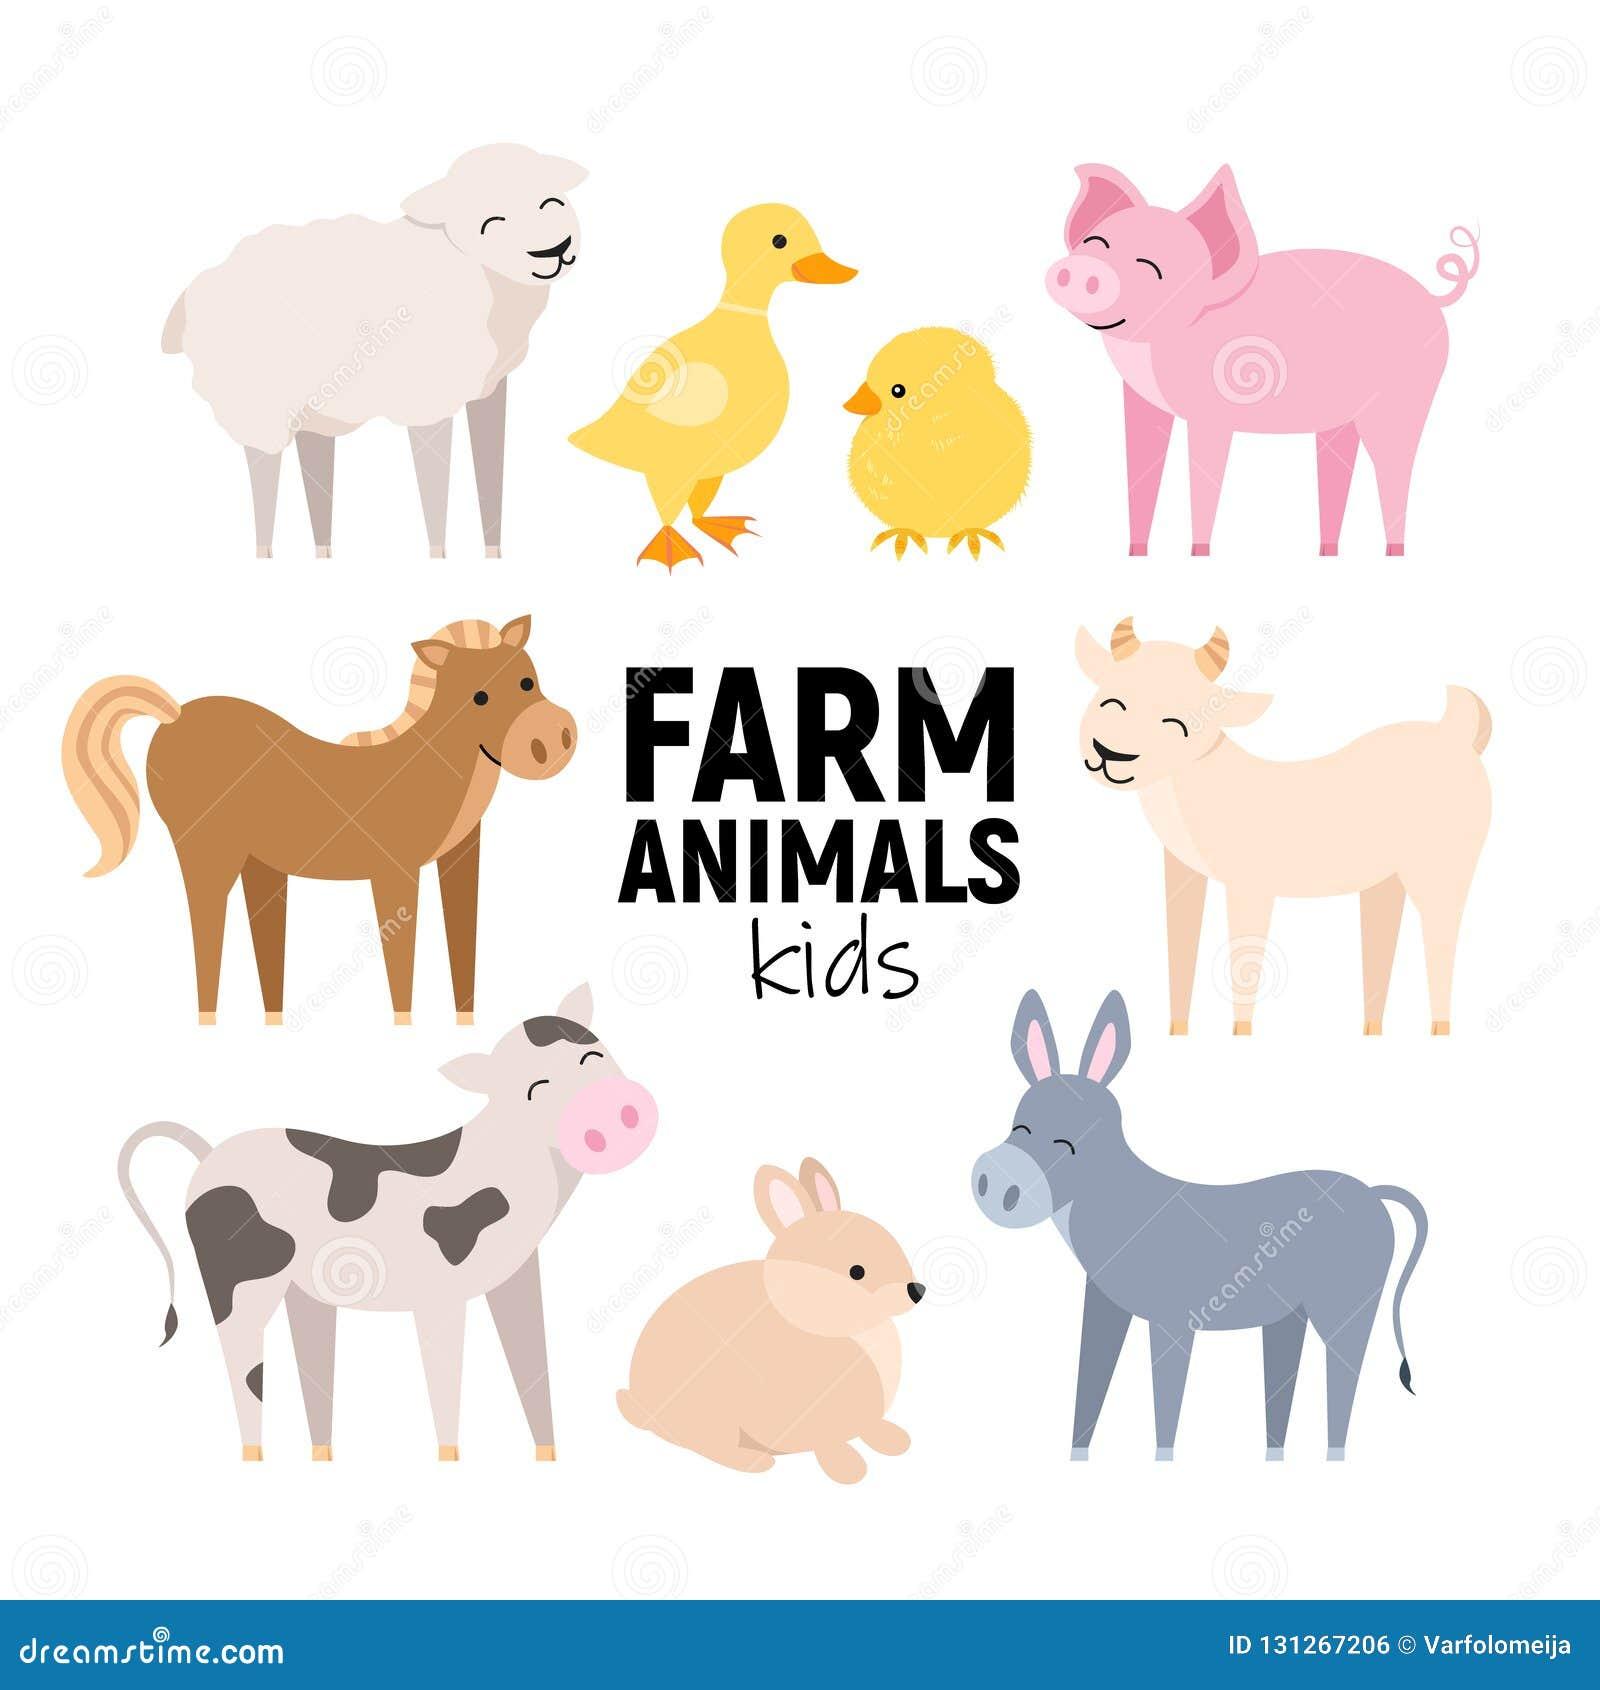 Animales del campo lindos vaca, cerdo, cordero, burro, conejito, polluelo, caballo, cabra, pato aislado Los animales domésticos e